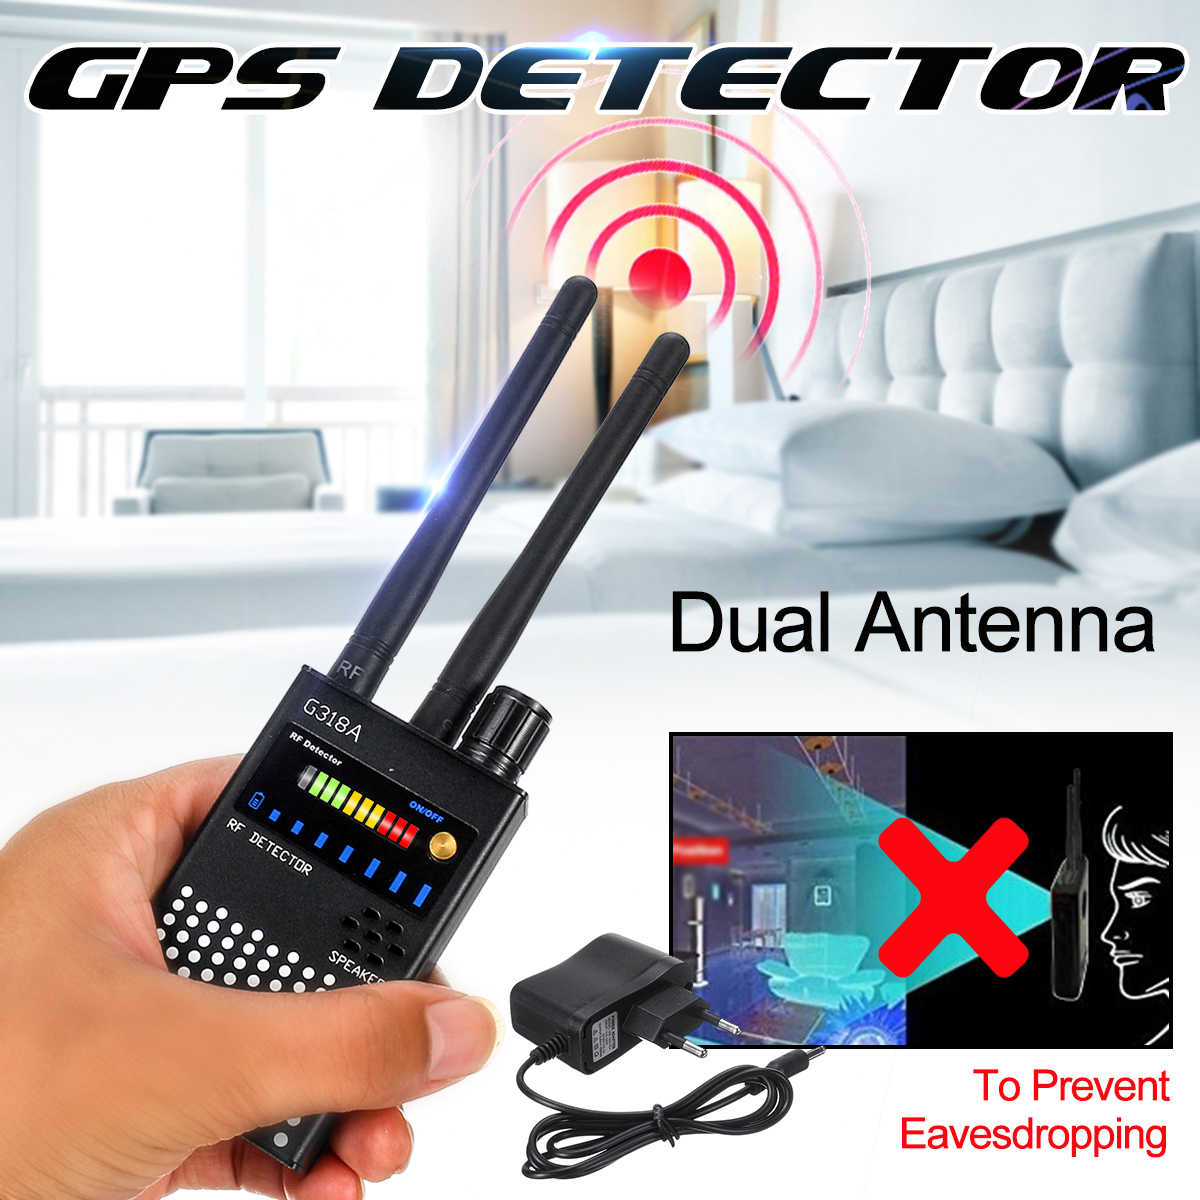 G318A هوائي مزدوج مضاد للتجسس جي بي إس إشارة لاسلكية كاشف تلقائي مكتشف راكر تردد مسح كاسحة حماية الأمن